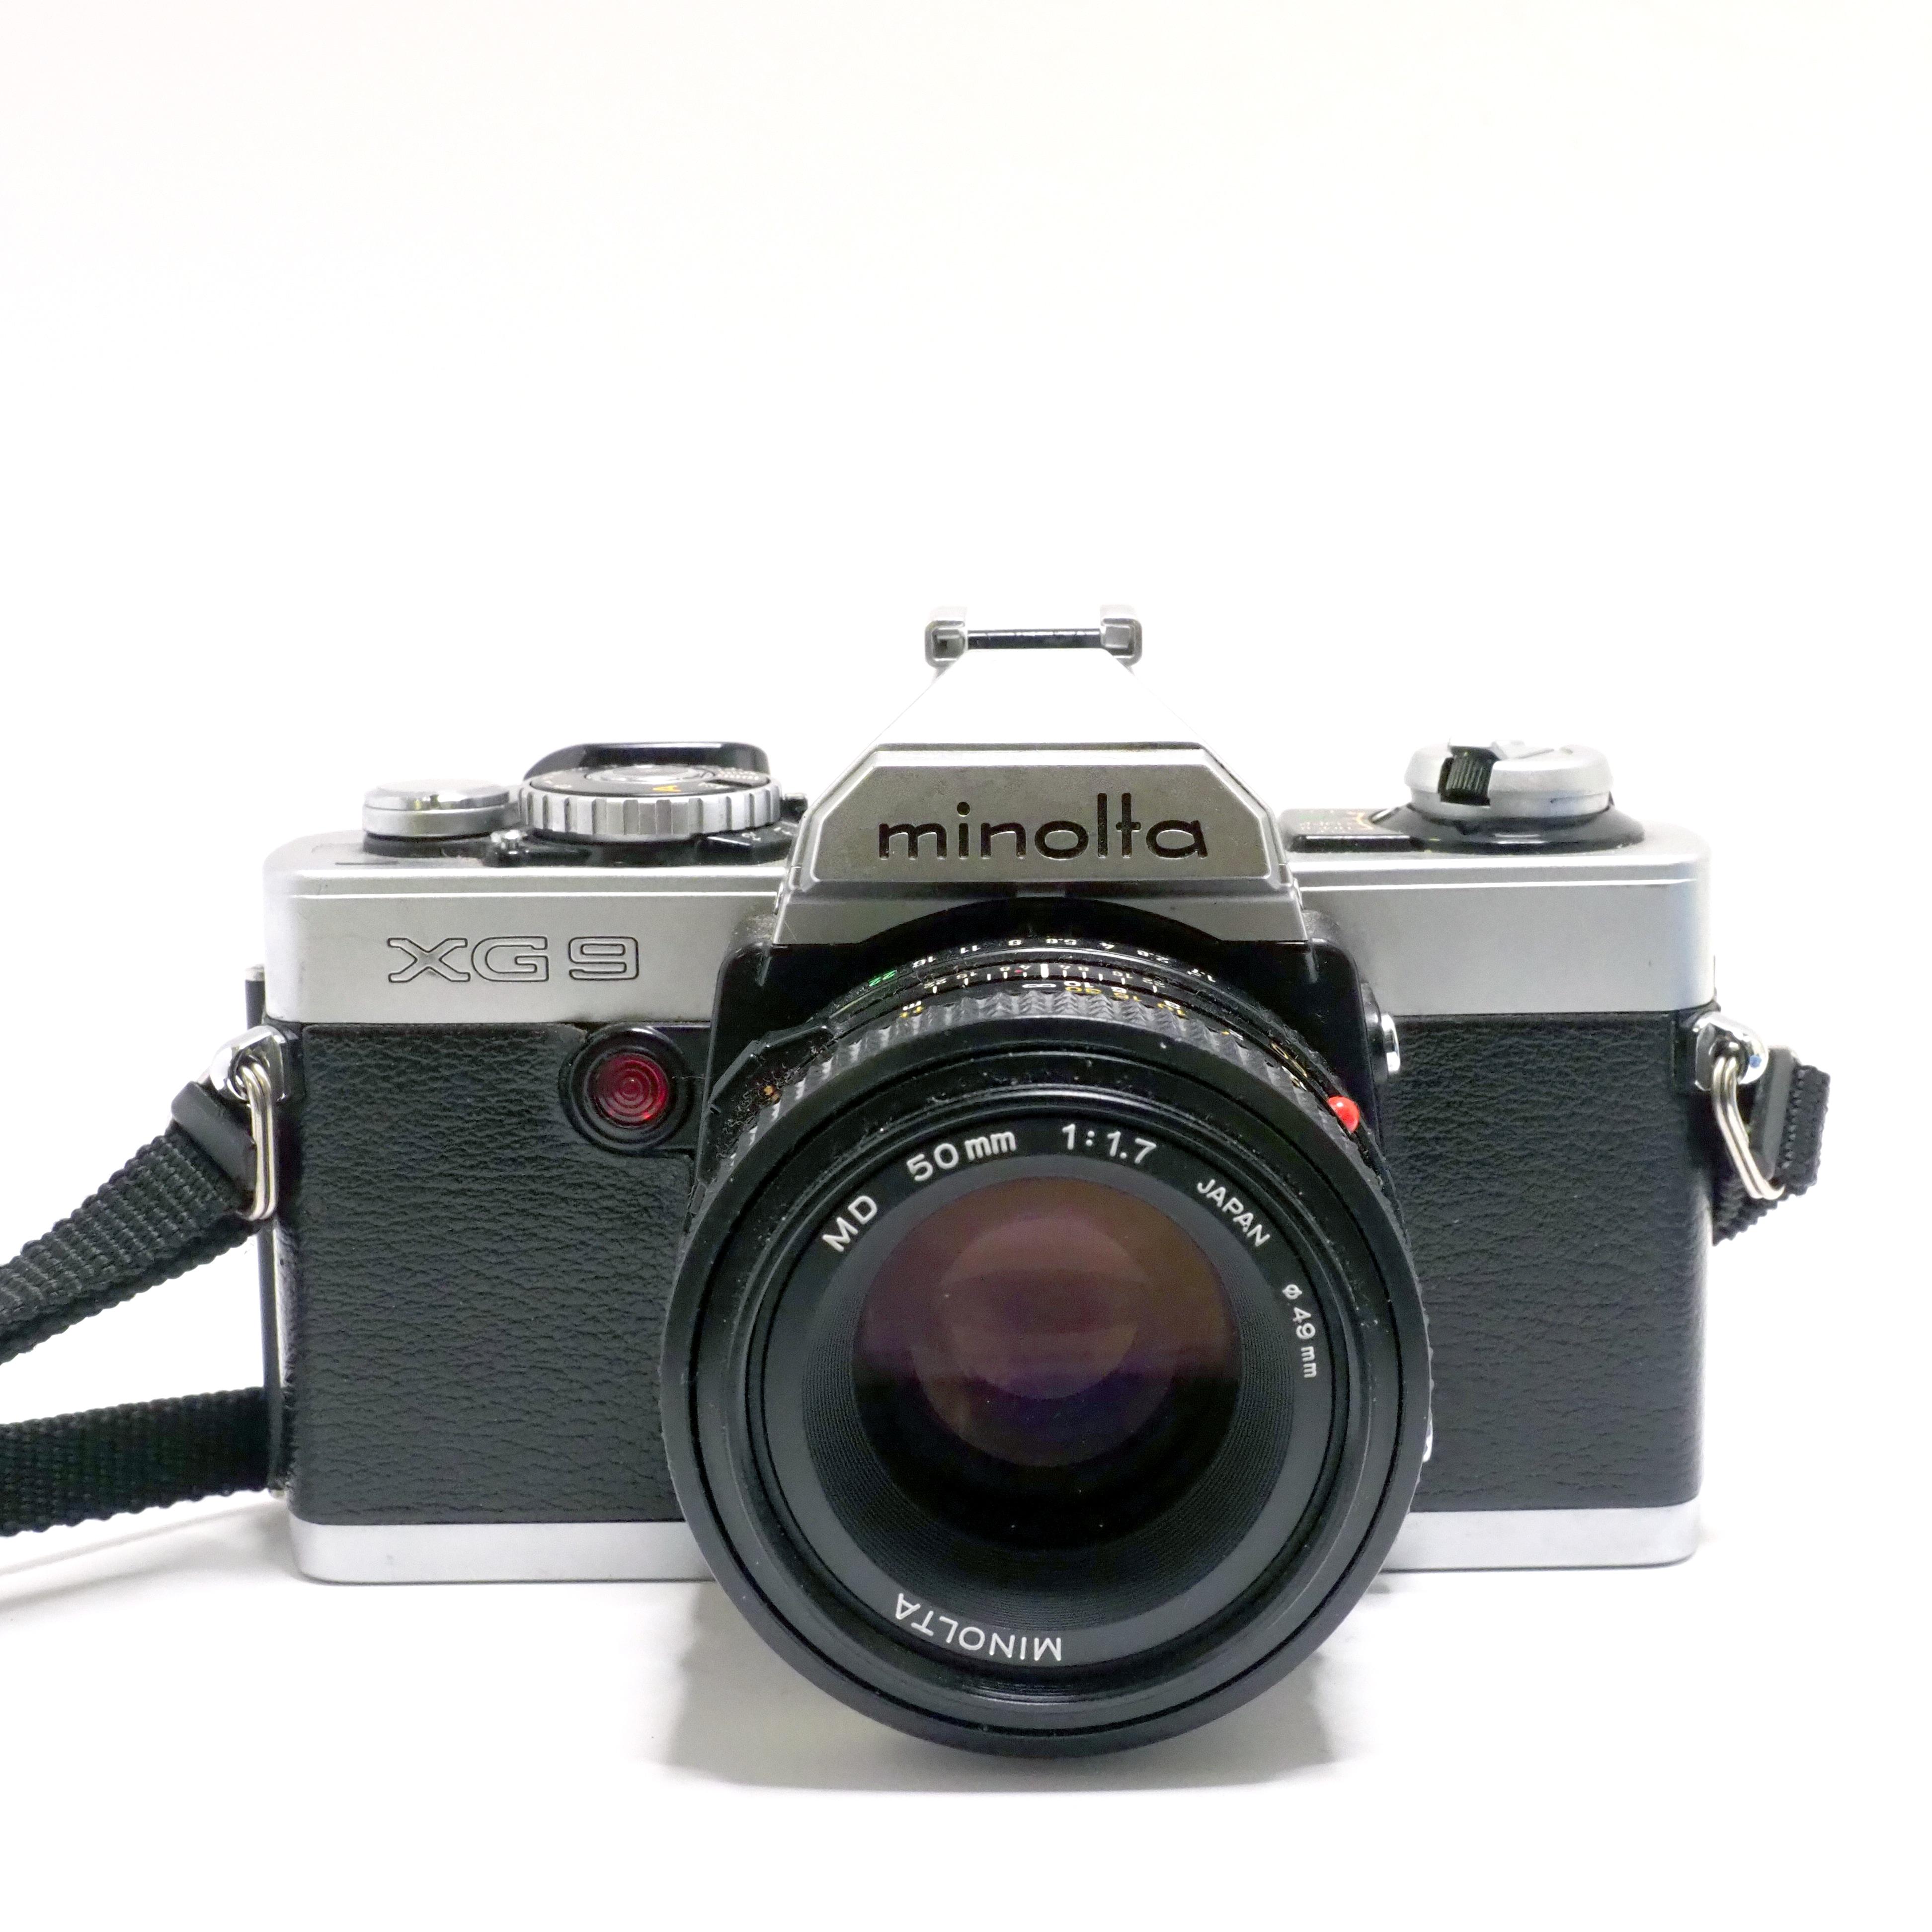 Minolta xg9 + 50mm MD f/1,7 - BEGAGNAT